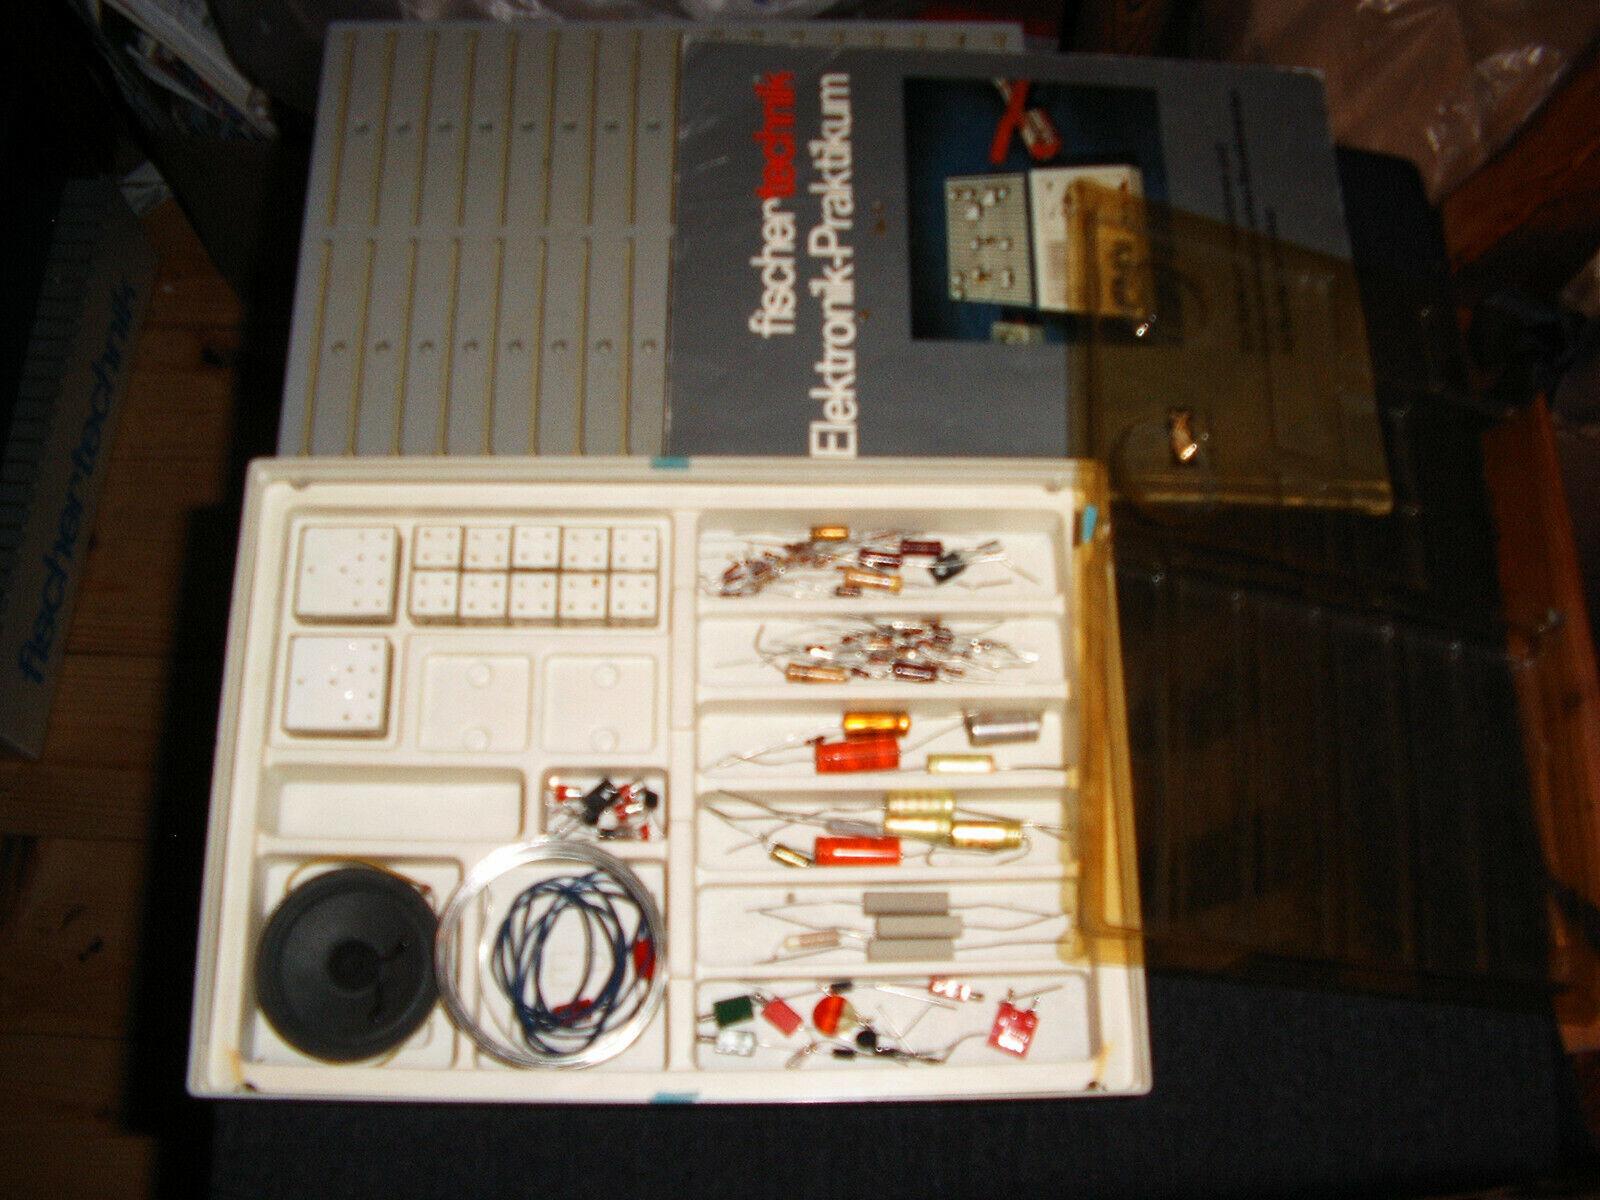 Fischertechnik Baukasten Elektronik Praktikum Elektronik, mit Anleitung B, 500